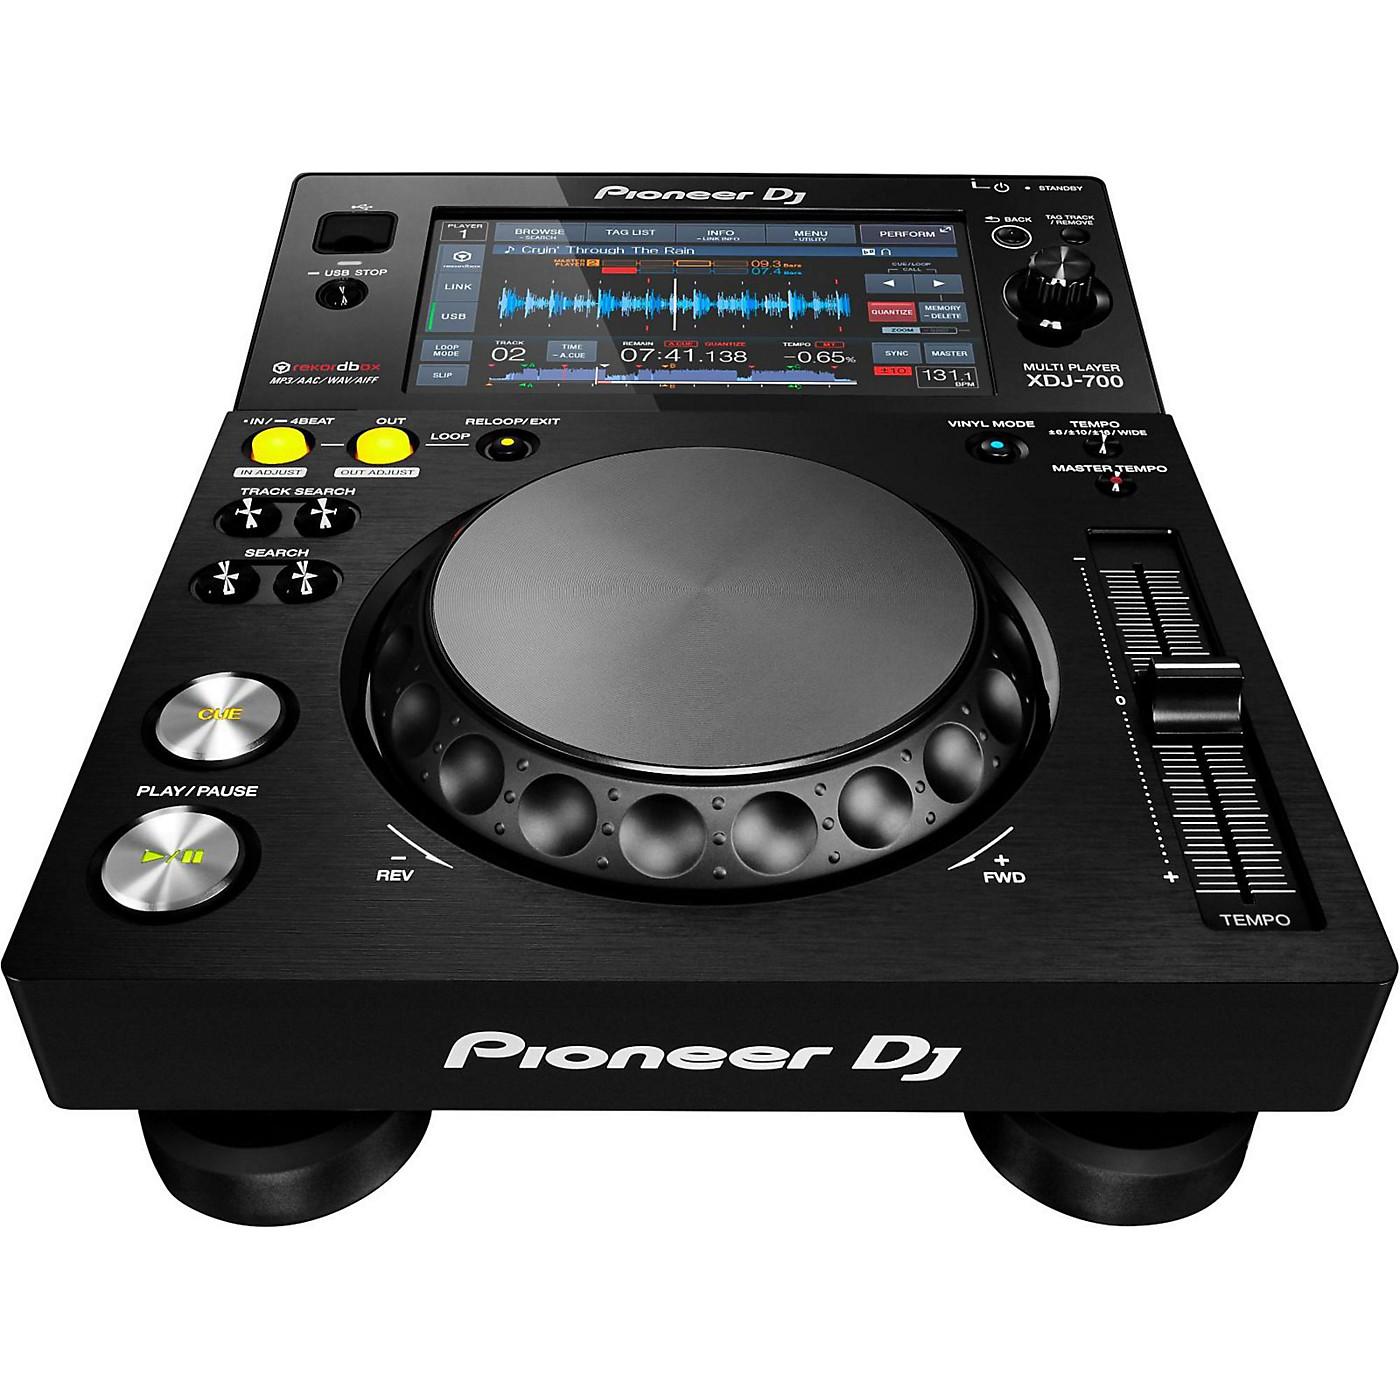 Pioneer DJ XDJ-700 Compact Digital Player thumbnail